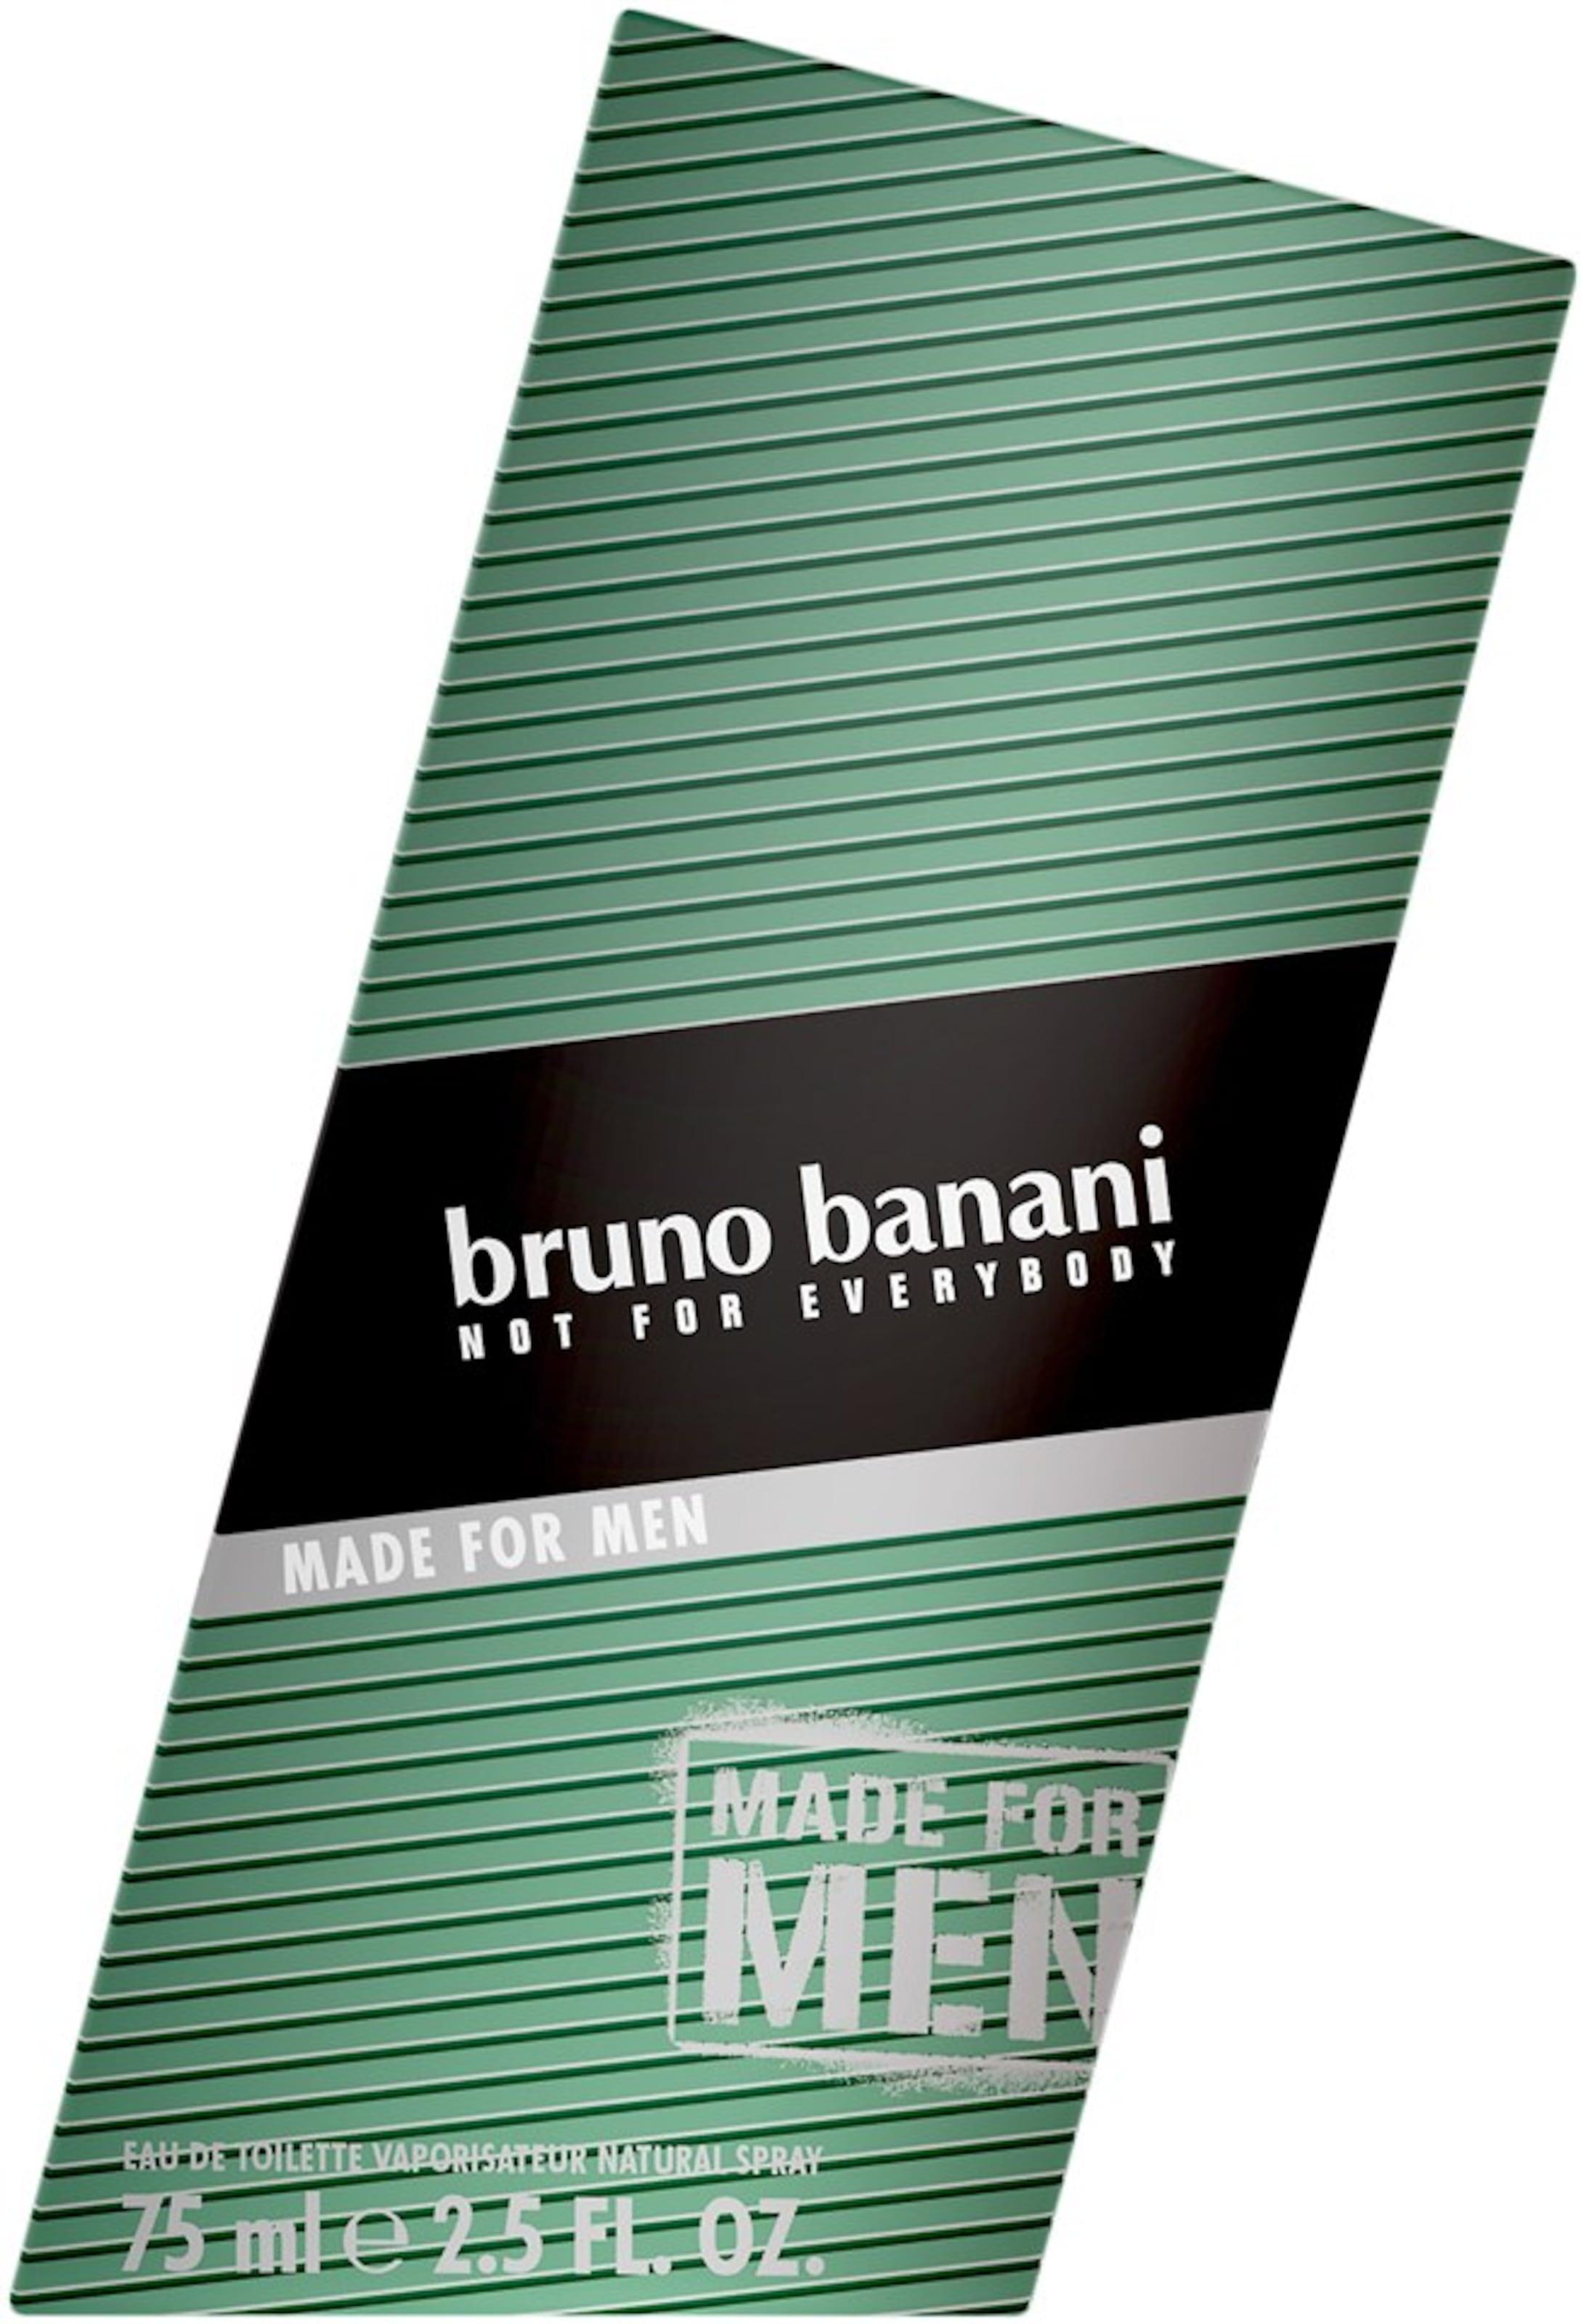 BRUNO BANANI 'Made for Men', Eau de Toilette